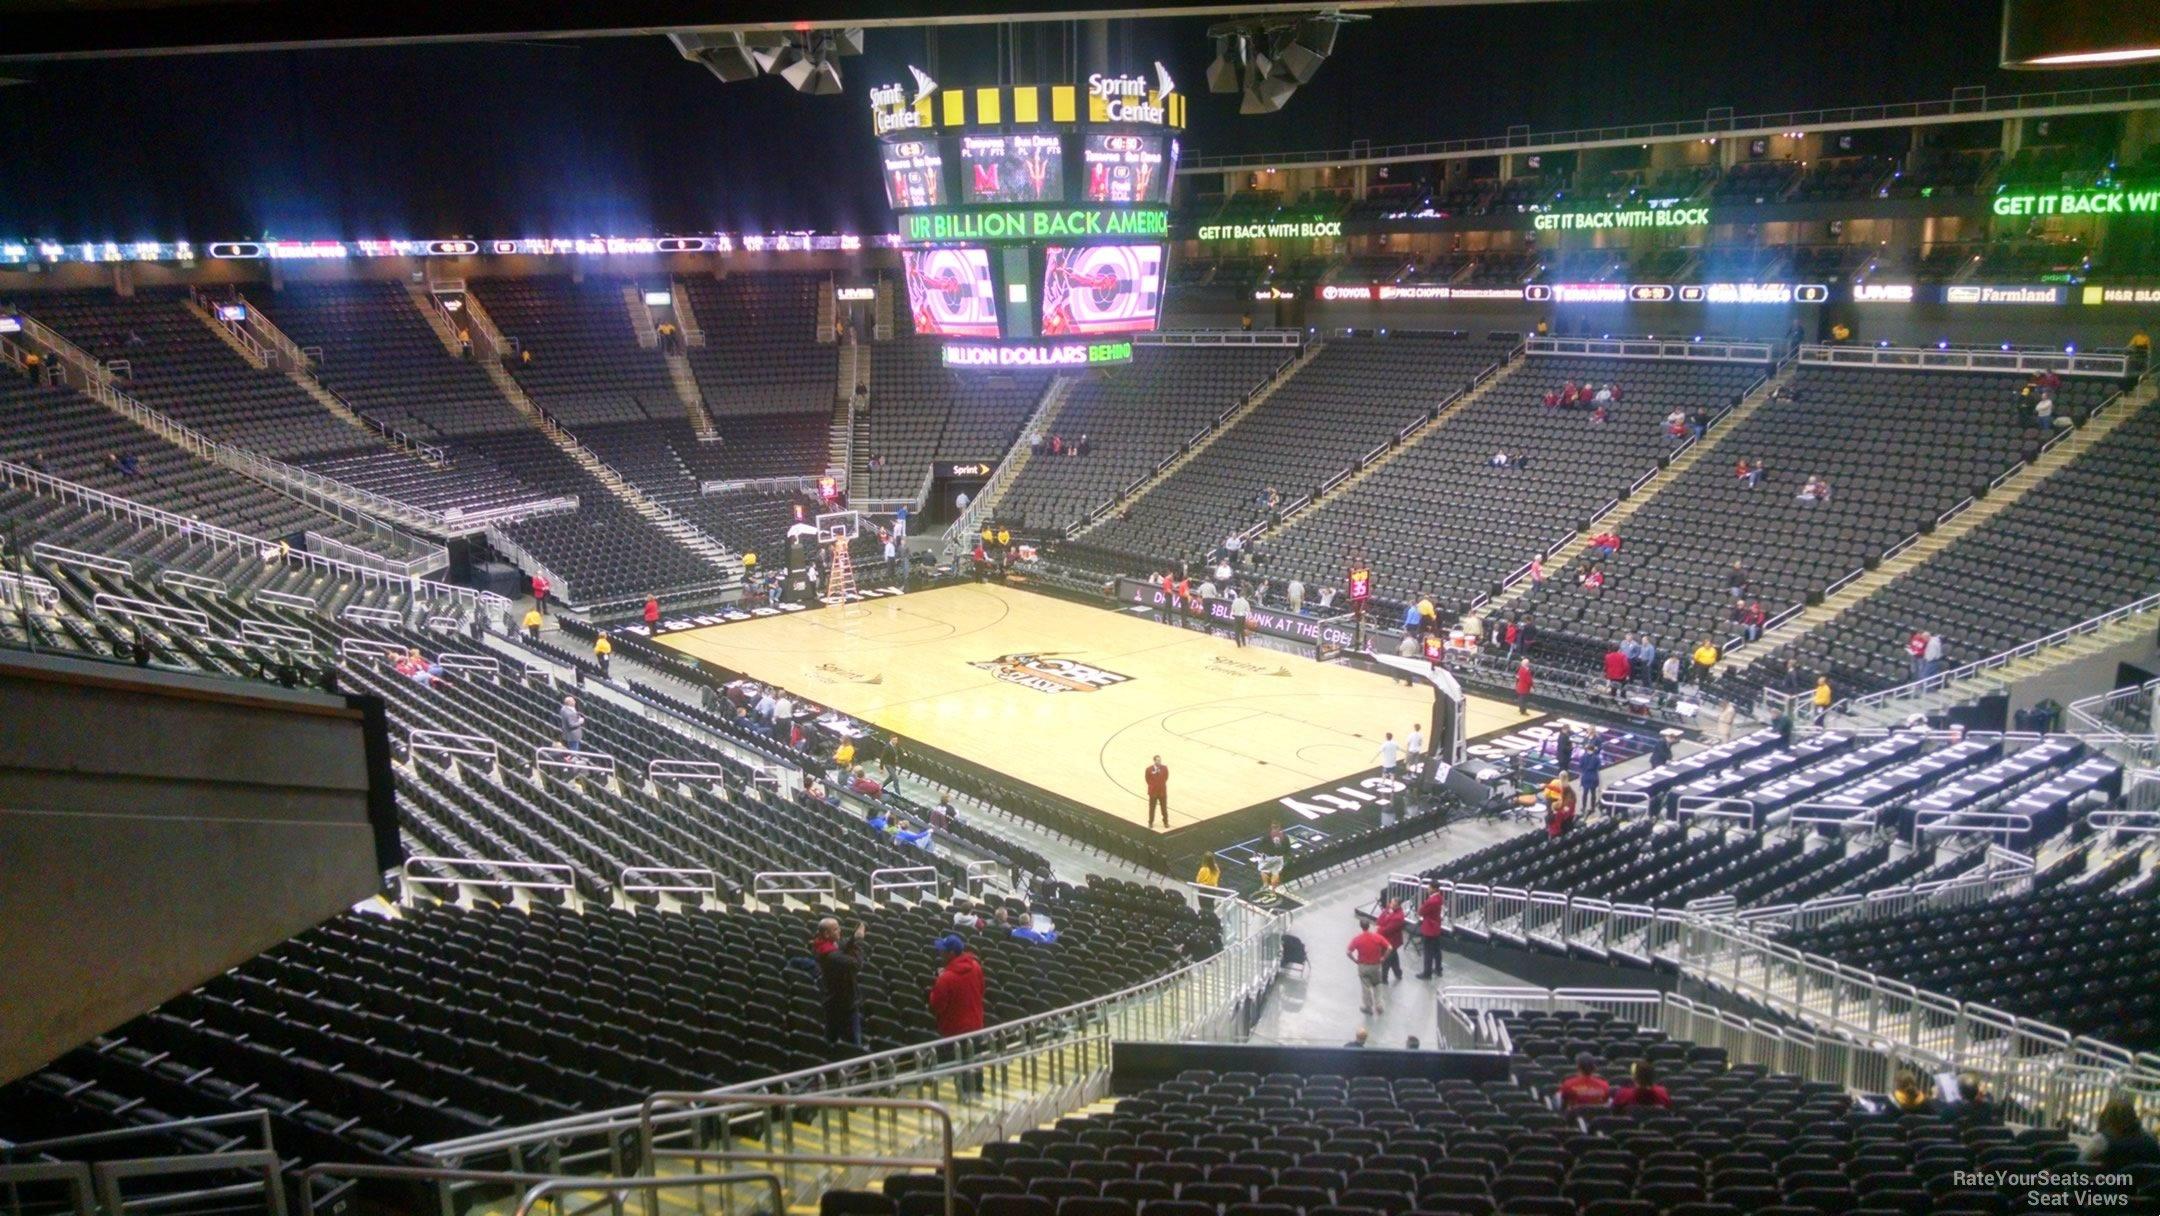 Sprint Center Kansas City Seating View